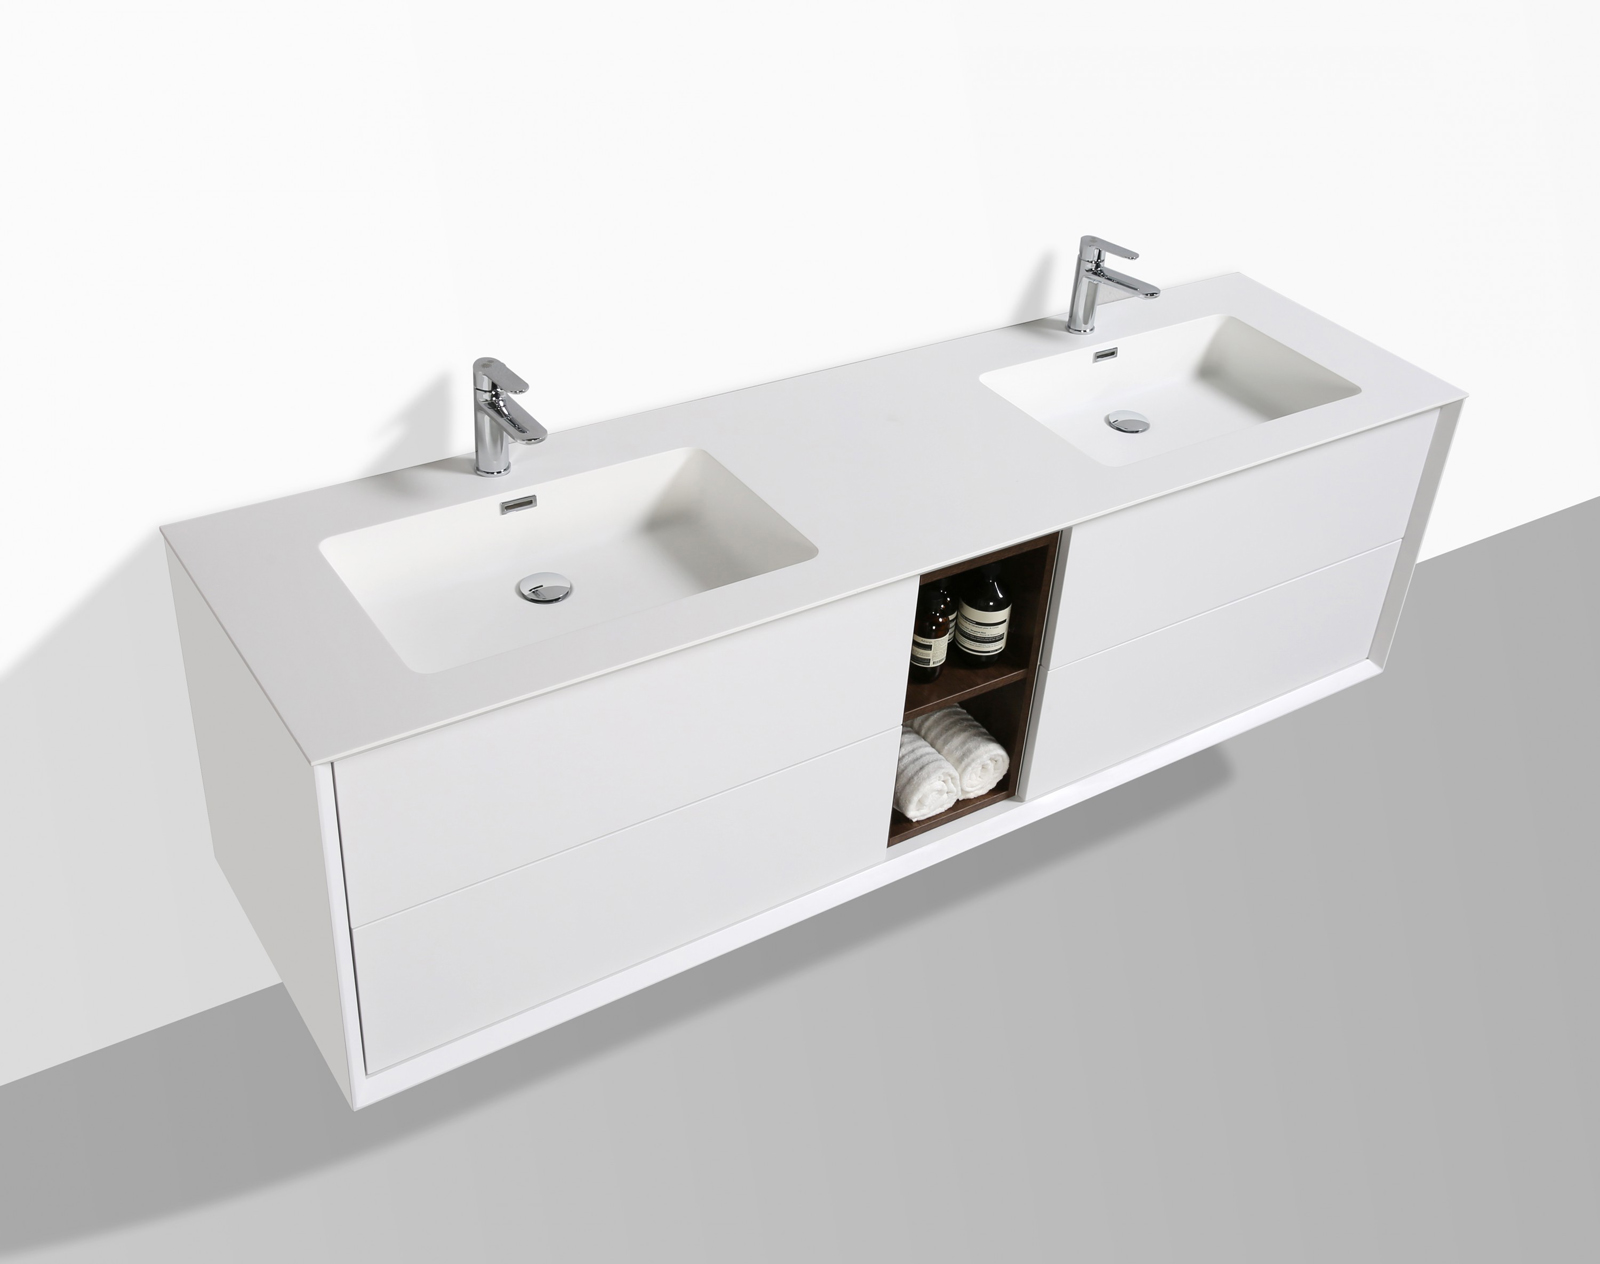 Tappo Della Vasca Da Bagno In Inglese : Mobili da bagno set lavandino doppio lavabo bianco opaco